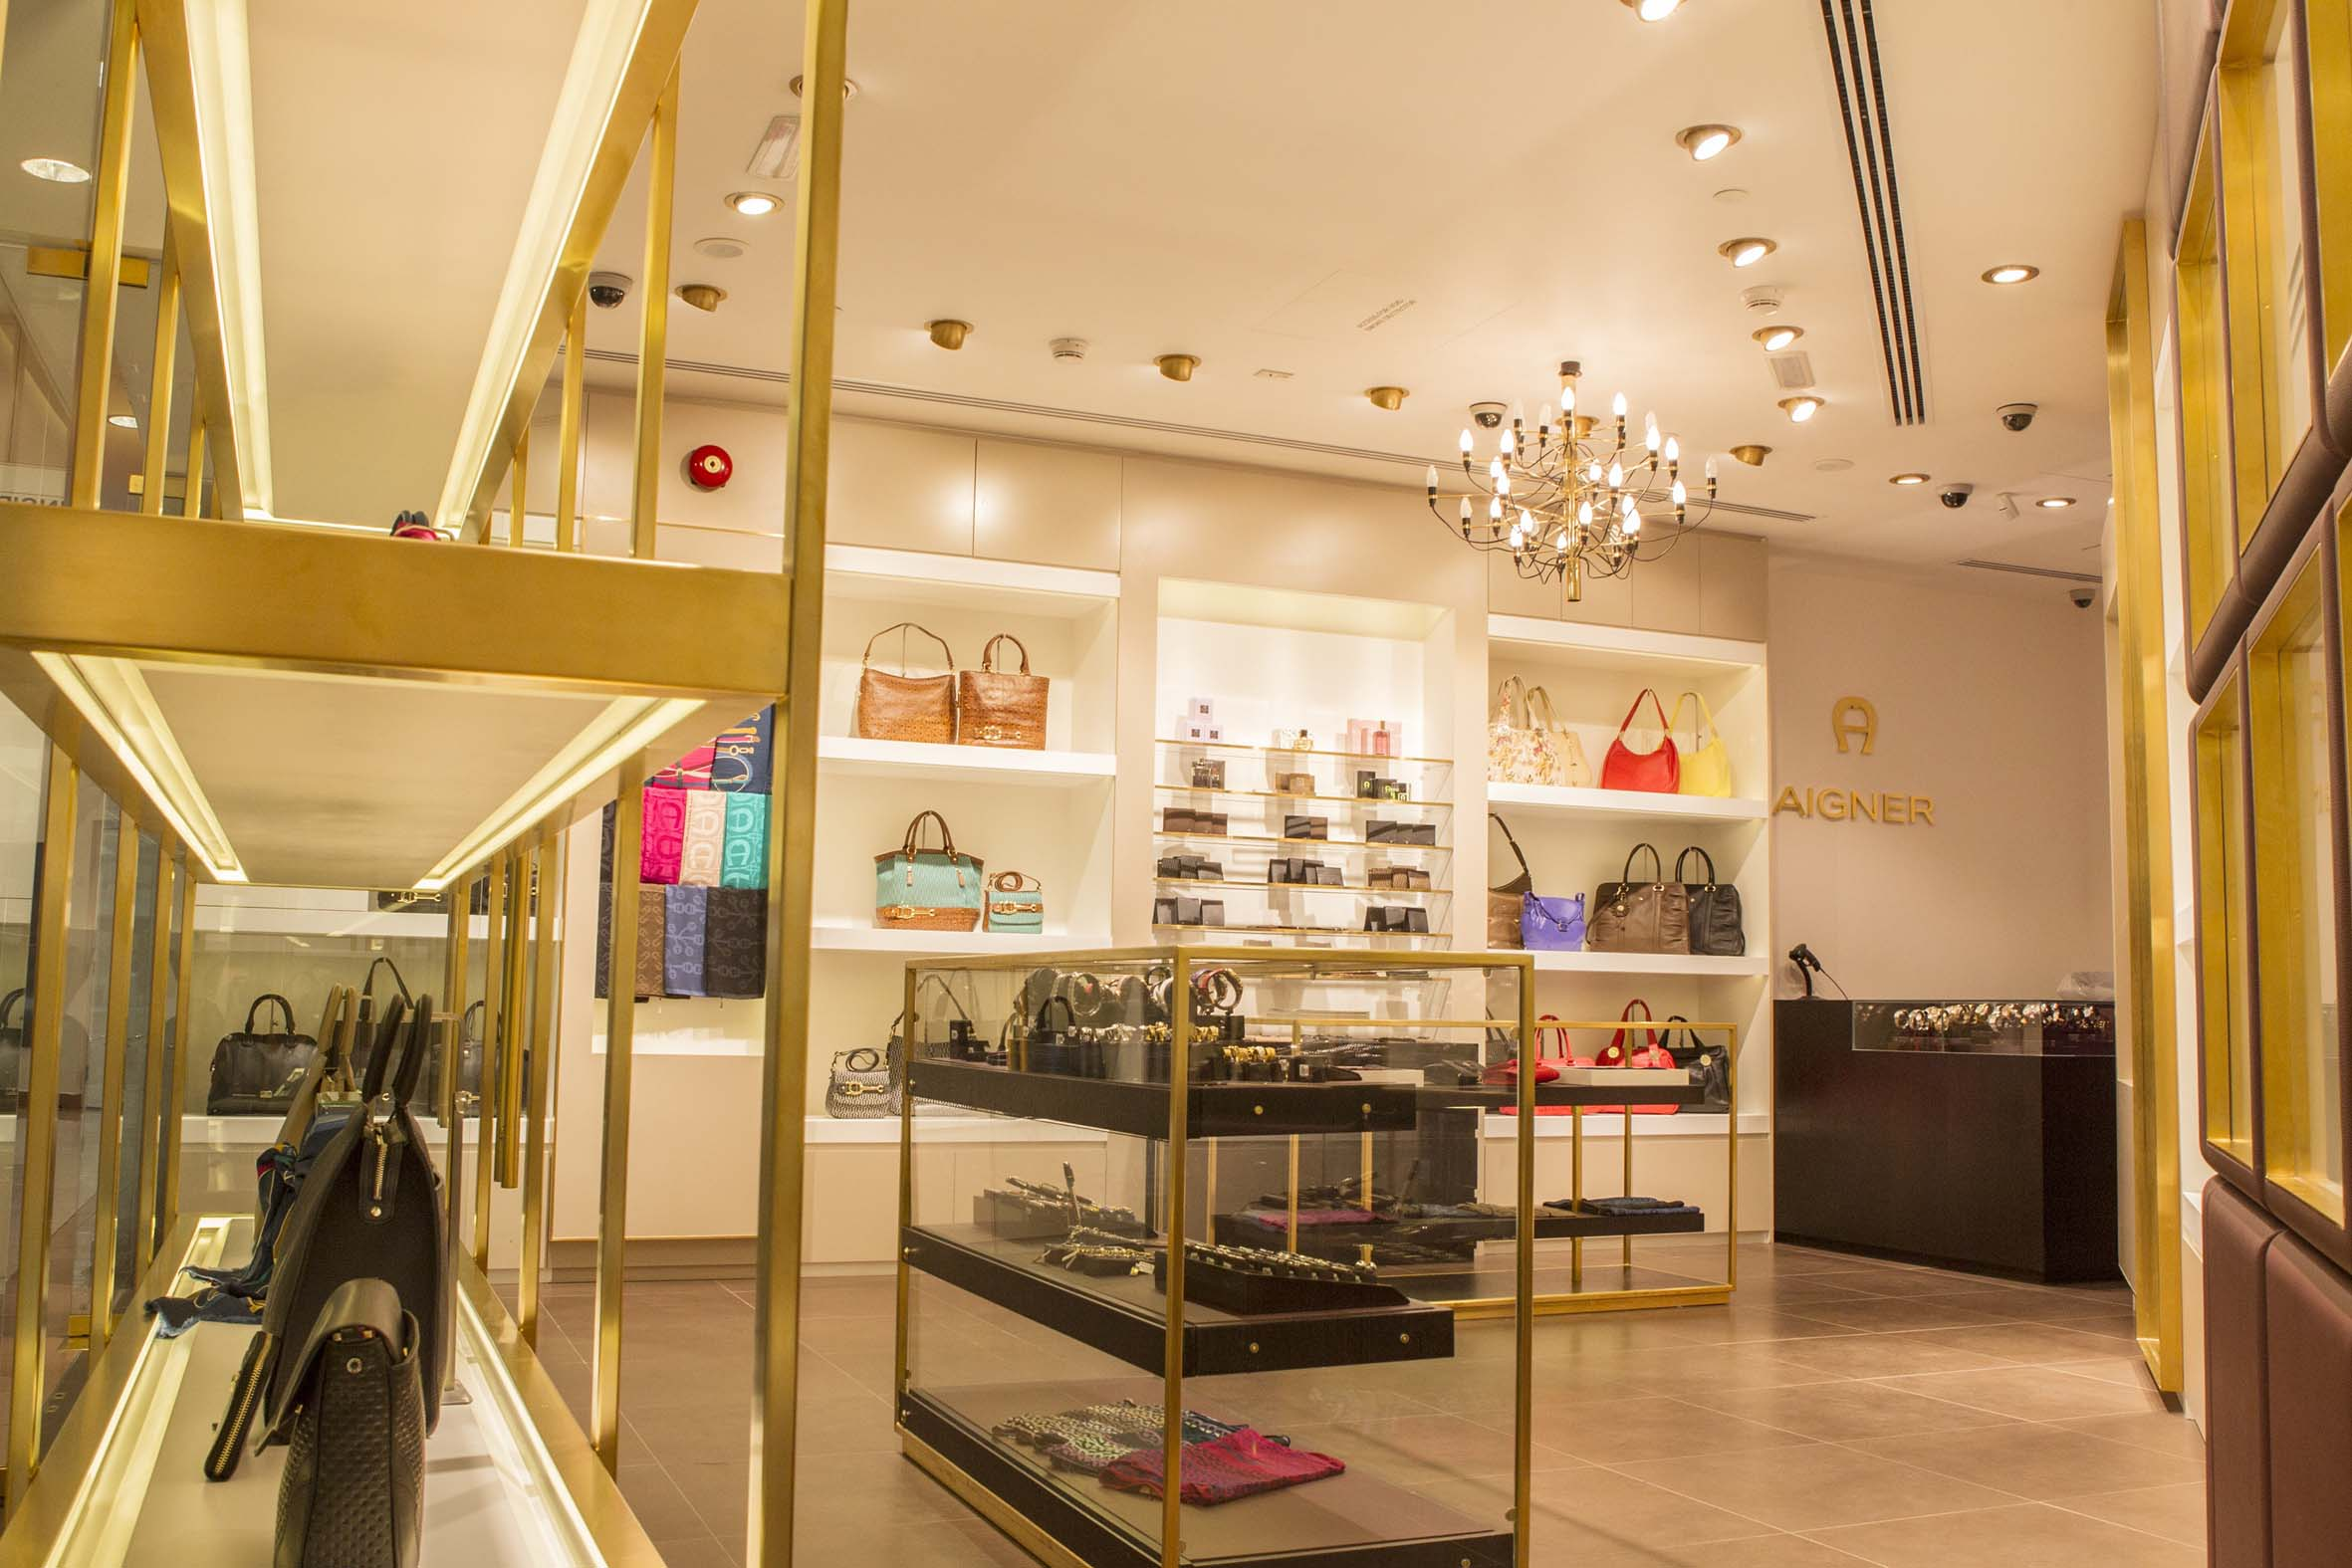 AIGNER - Marina Mall Abu Dhabi 13